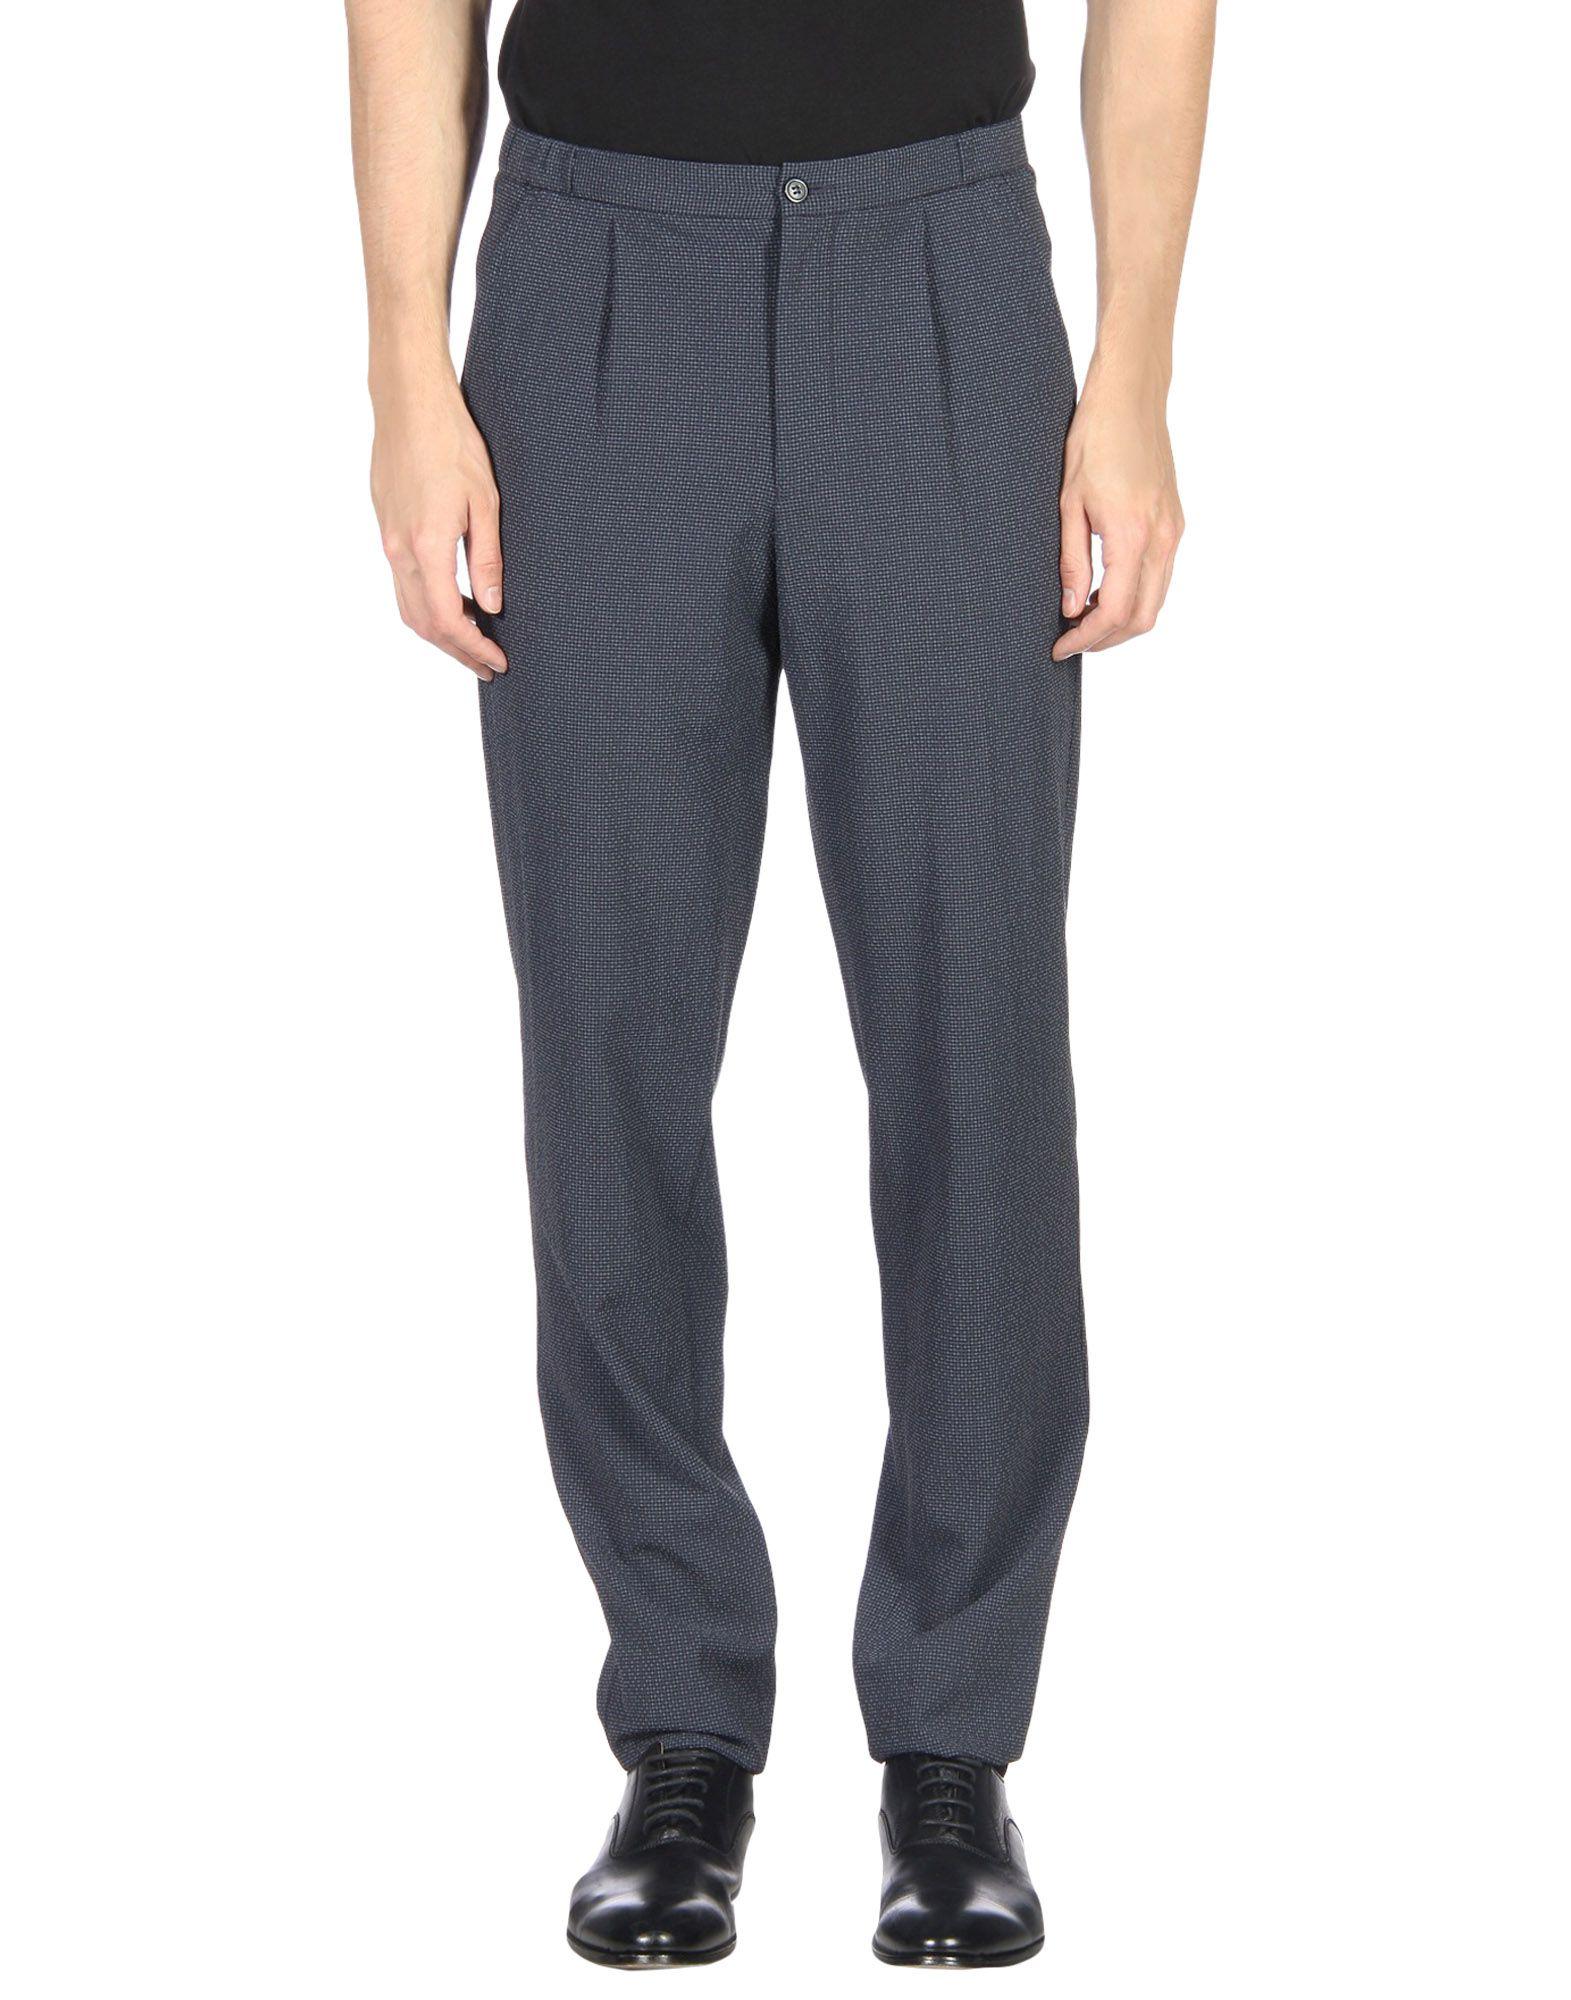 Pantalone Emporio Armani - Uomo - Armani 36986823XX 00f446